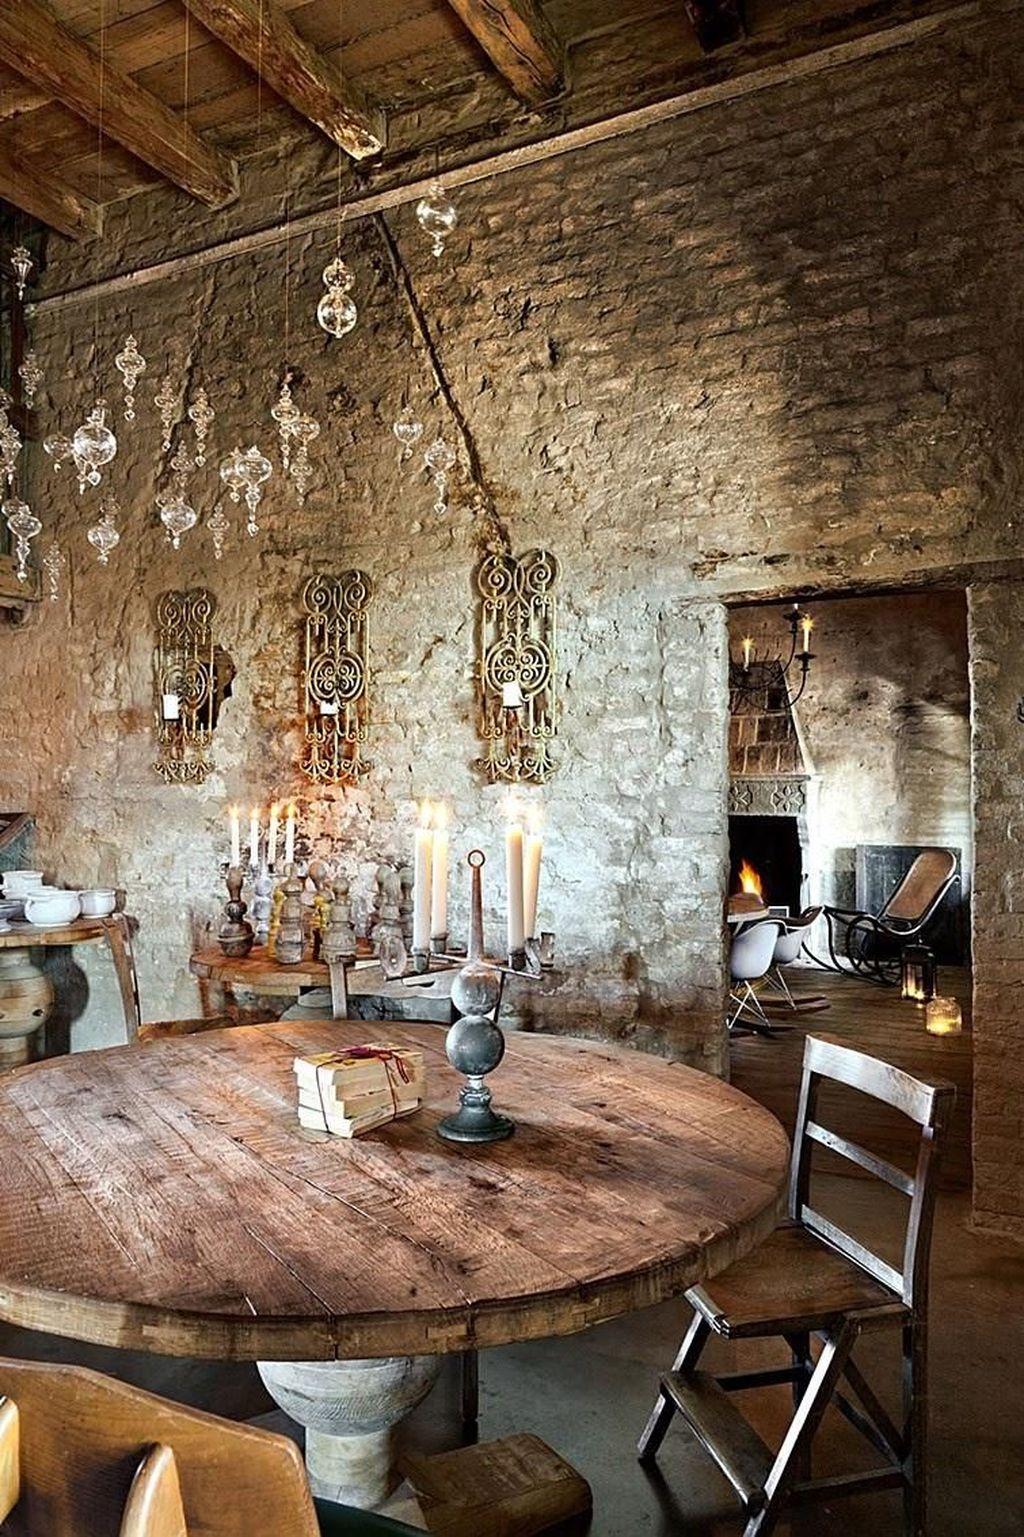 Fabulous Rustic Italian Decor Ideas For Your Home 13